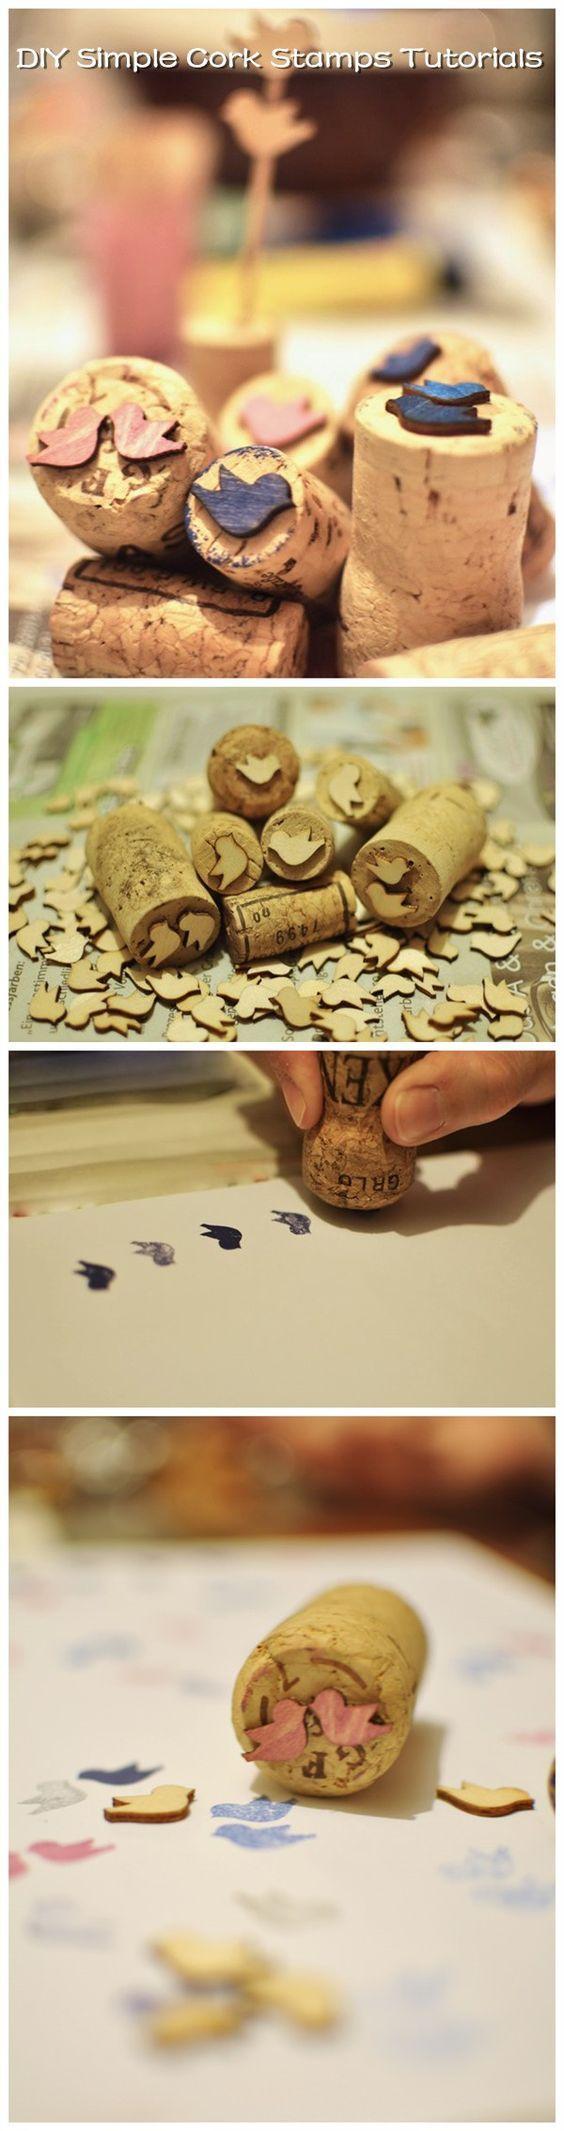 DIY Simple Cork Stamps Tutorials: